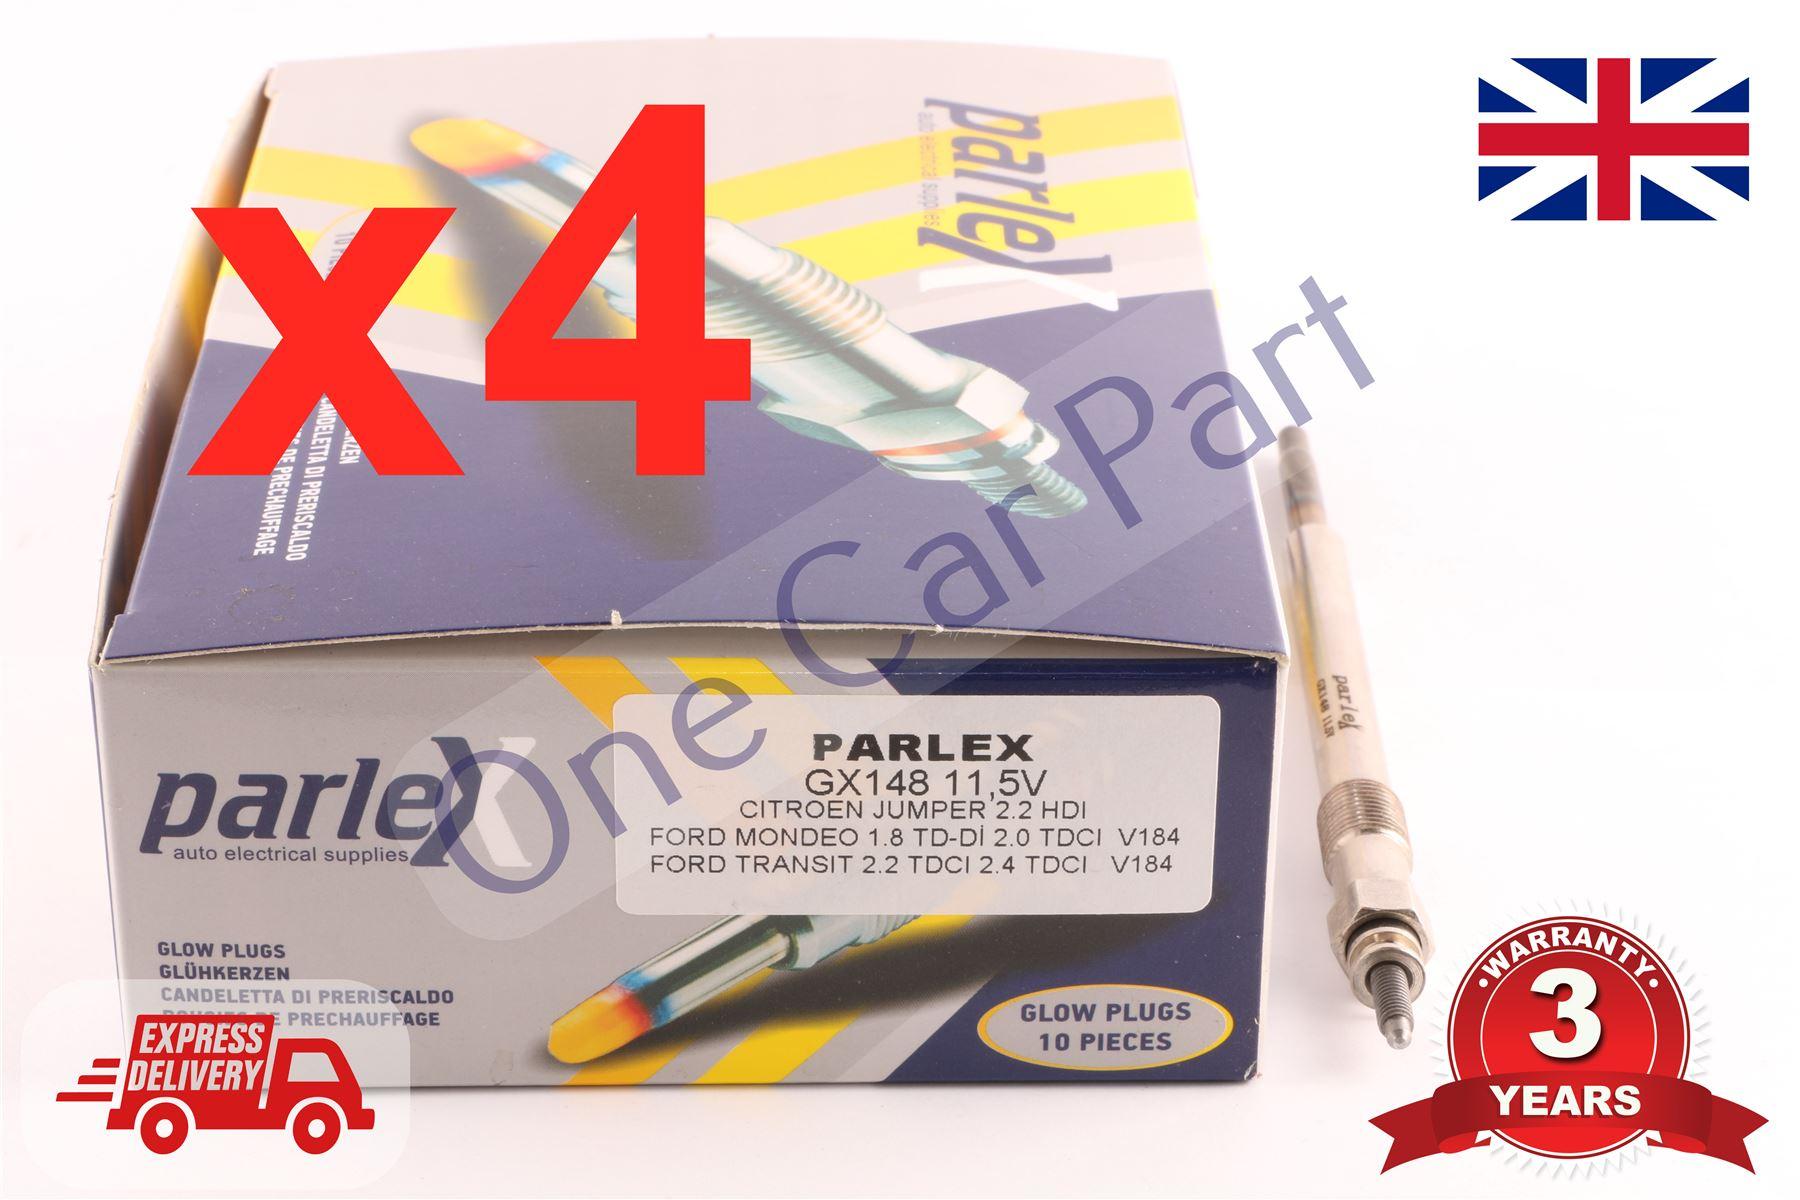 4 Glühkerzen BOSCH 2.0 2.2 HDI TDCI Ford Mondeo III Transit Citroen Jumper Boxer